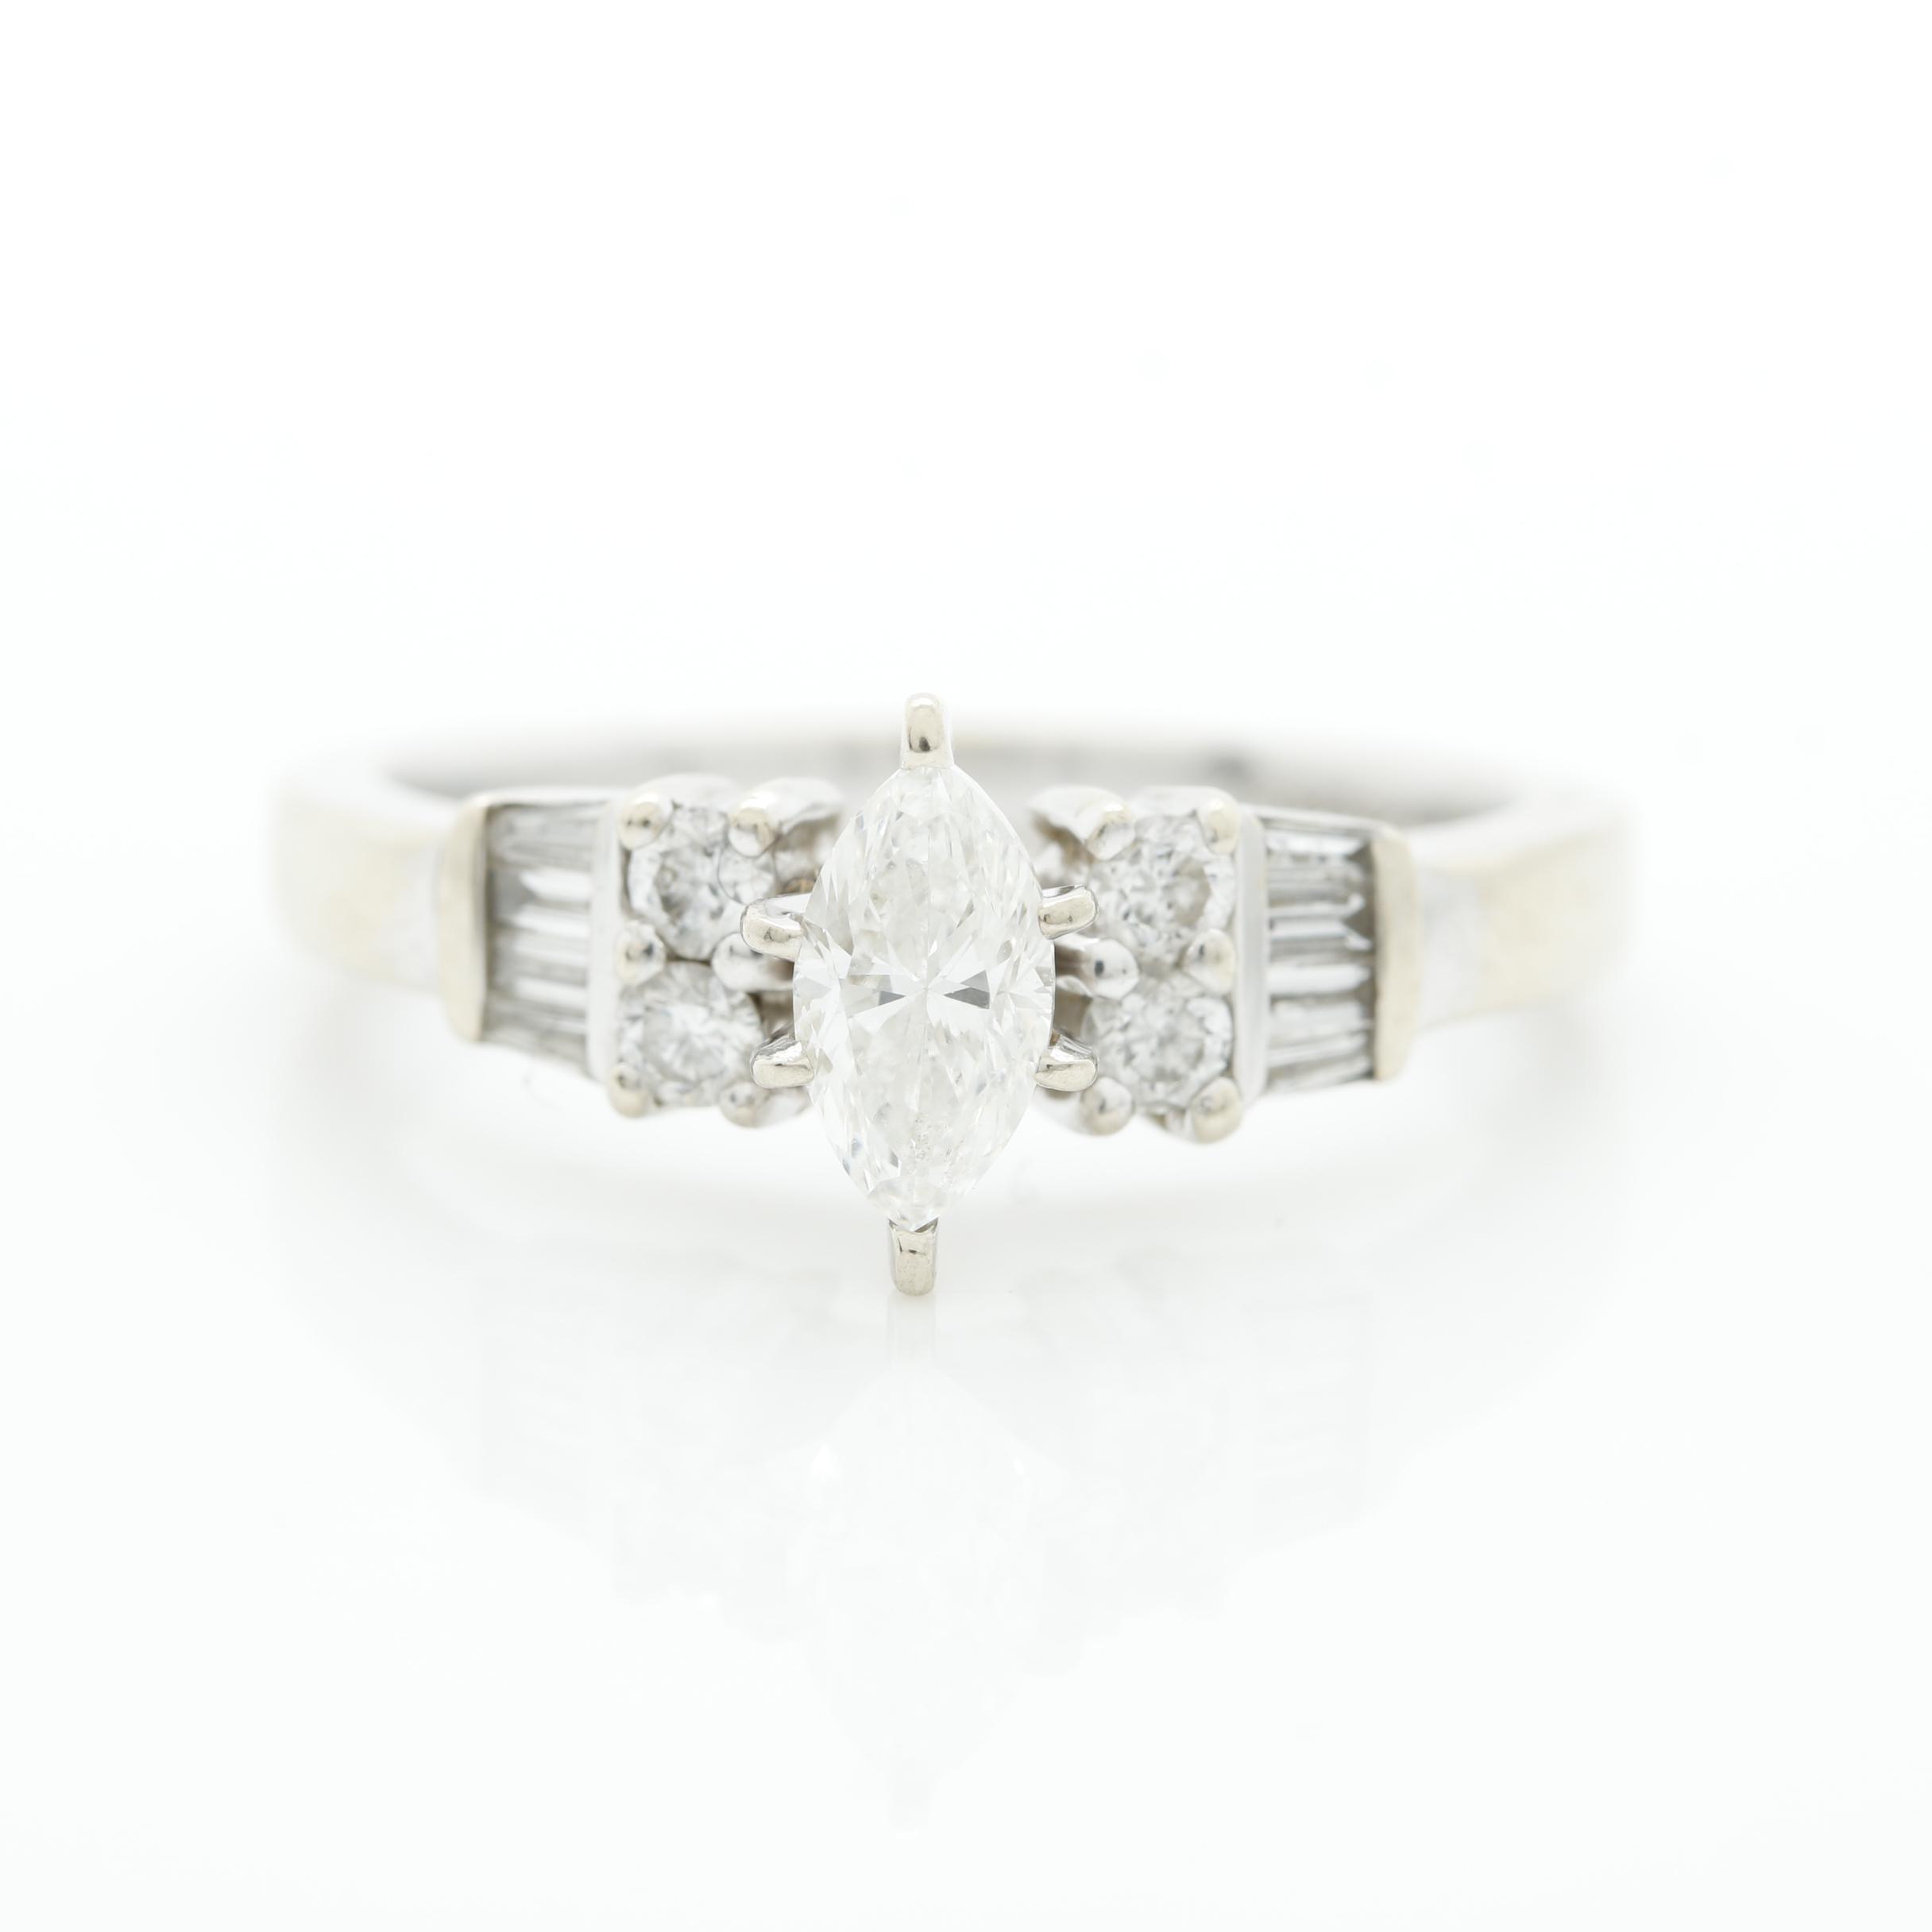 14K White Gold 0.84 CTW Diamond Ring